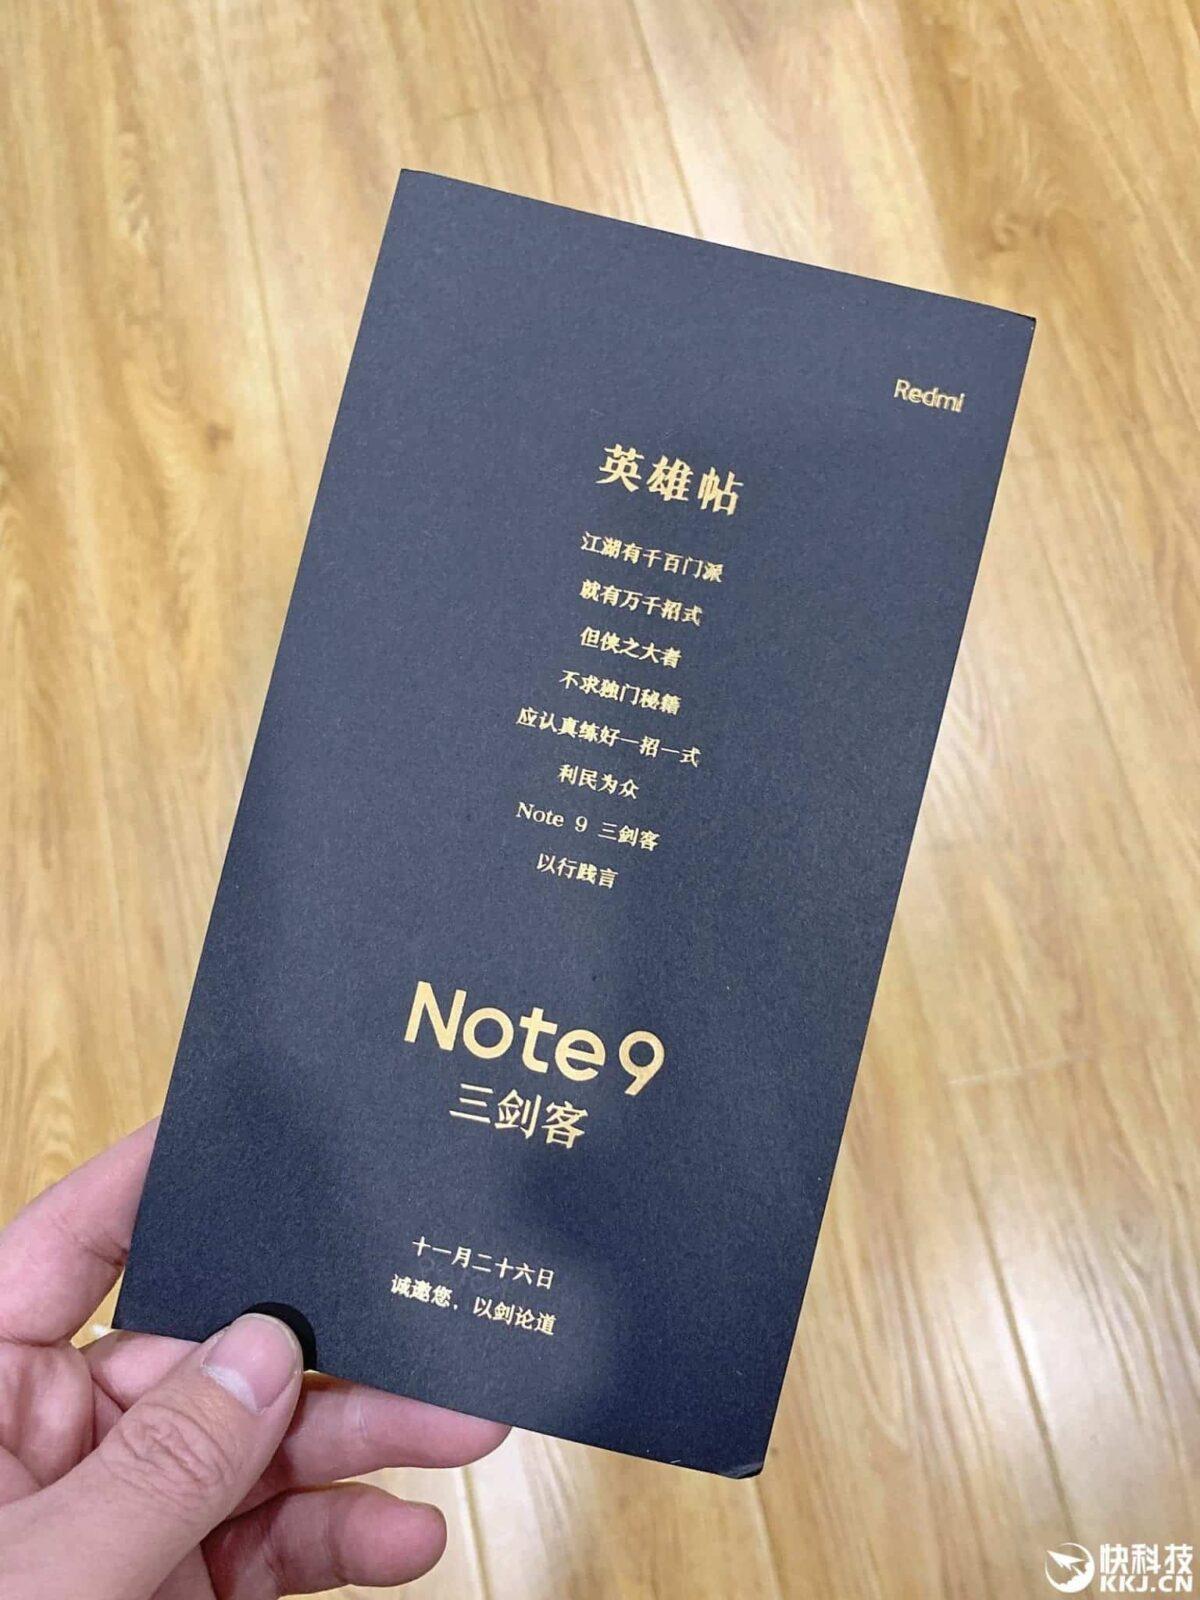 Redmi отправляет необычные приглашения на мероприятие по запуску смартфона Redmi Note 9 (24df1aa5703a4a00a56d46bc94f7cd7b 1536x2048 1)